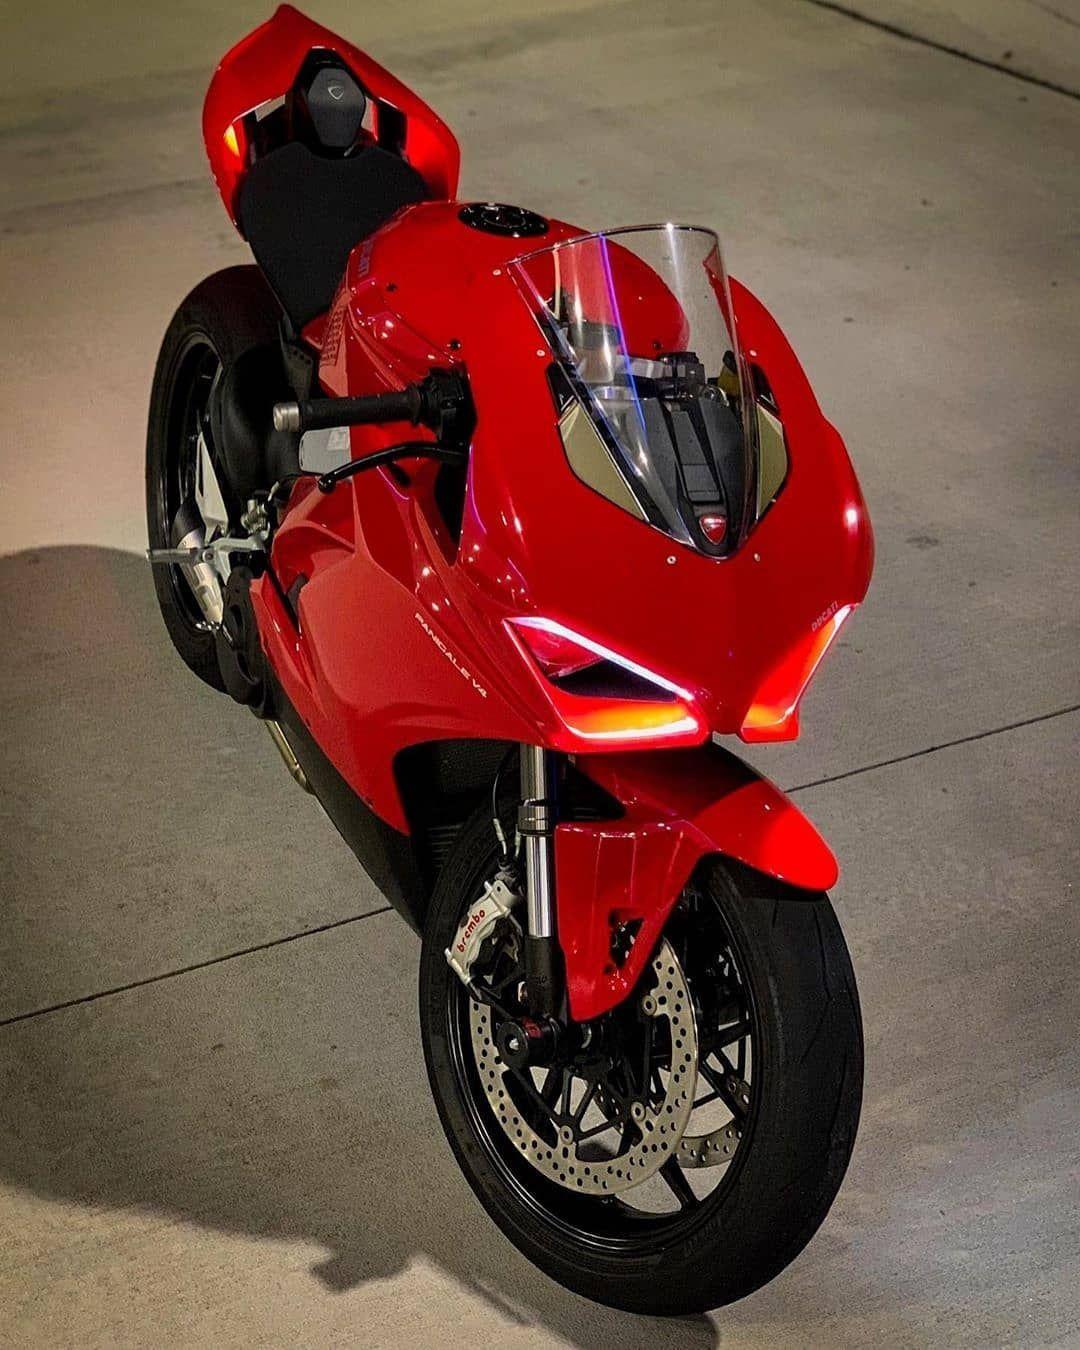 Panigalers On Instagram Chowski Moto No Filter Motogp Photography Ducatinstagram Lightech Ducativ4 Motomi Ducati Motorbike Racing Bikes Moto Ducati